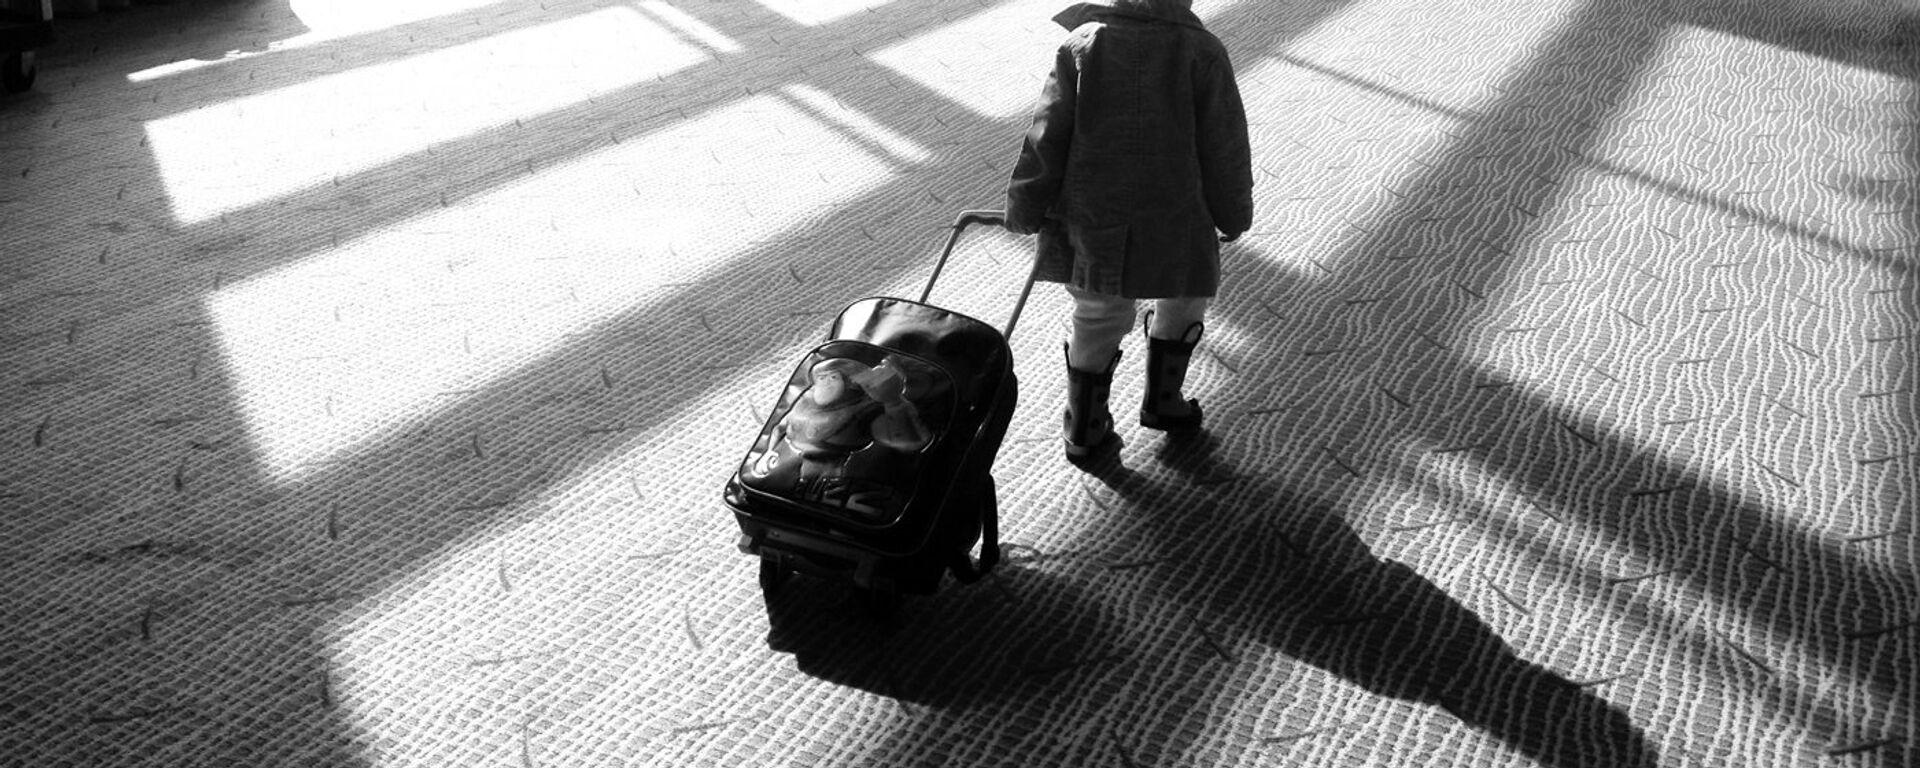 Малыш с чемоданом - Sputnik Latvija, 1920, 11.12.2018